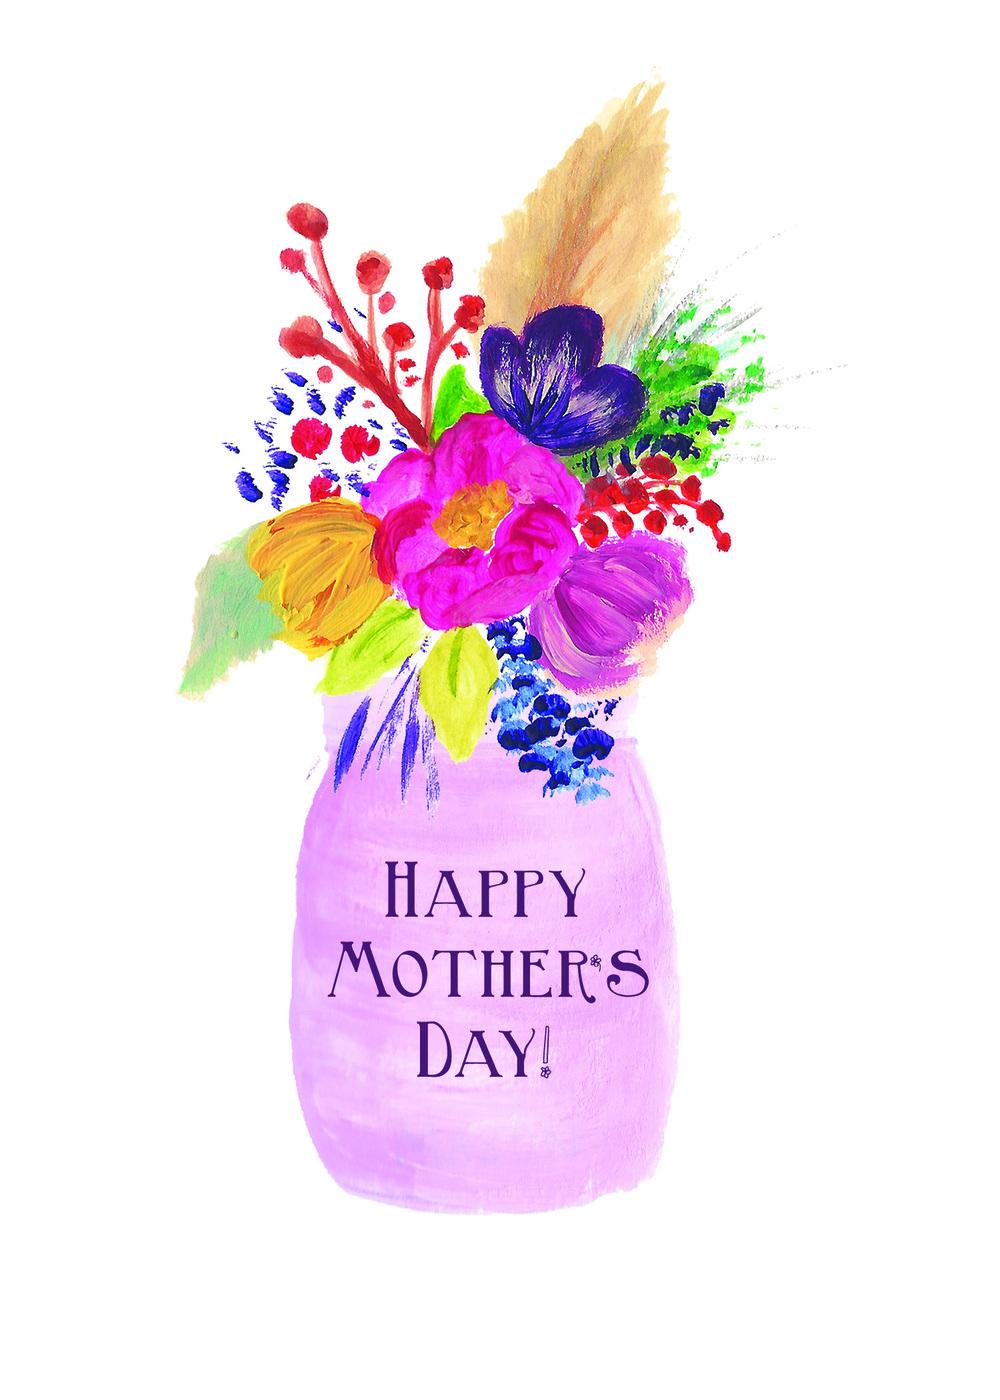 mothersdaymasonjar.jpg